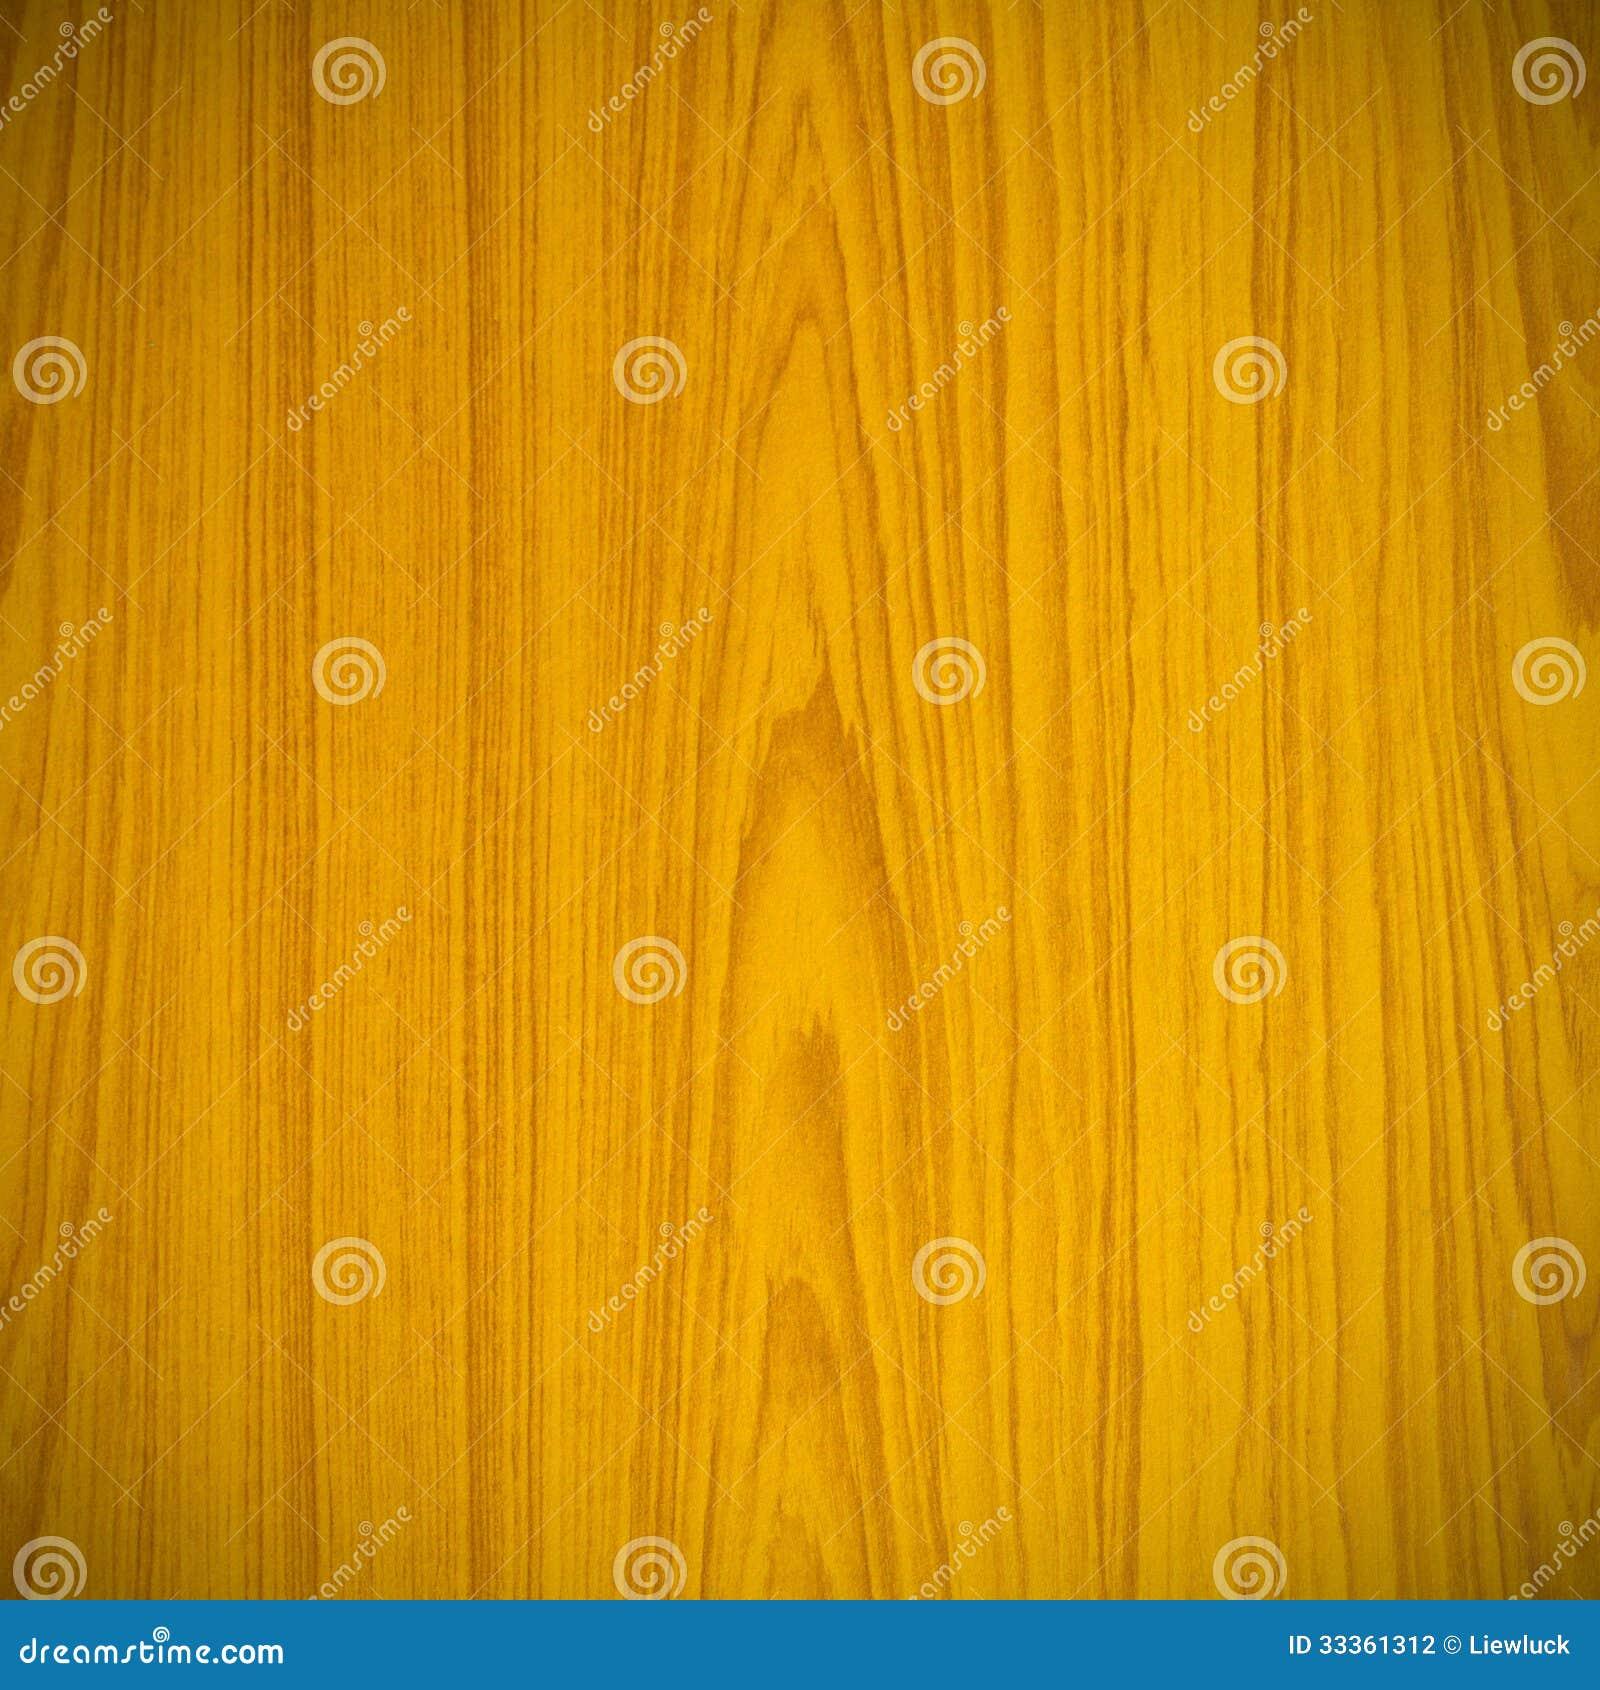 Wood Plank: Wood Plank Texture